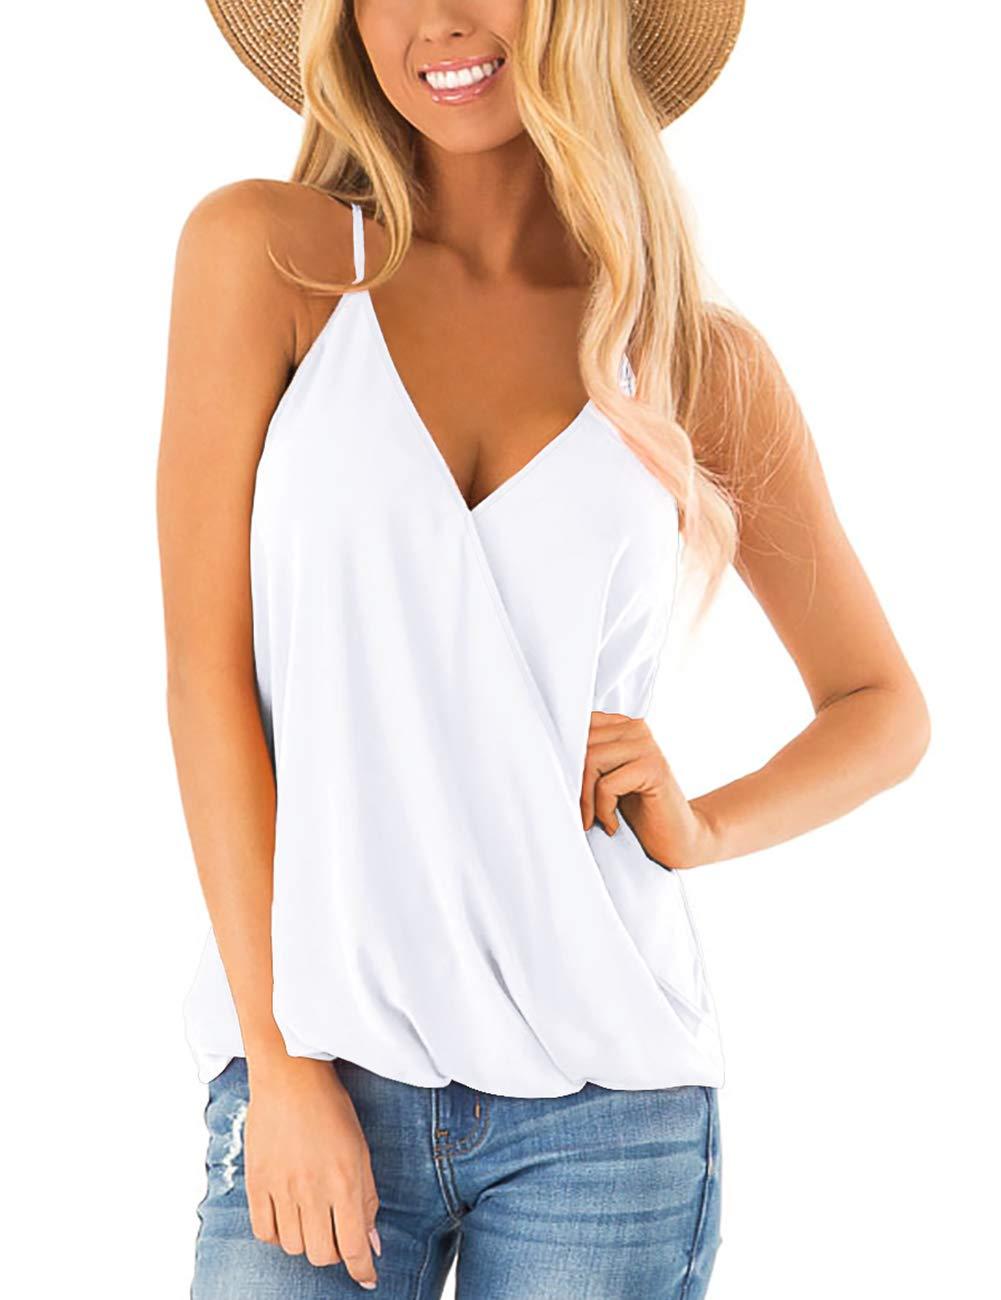 Aokosor Womens Deep V Neck Wrap Spaghetti Strap Tank Tops Summer Sleeveless Shirts Blouses